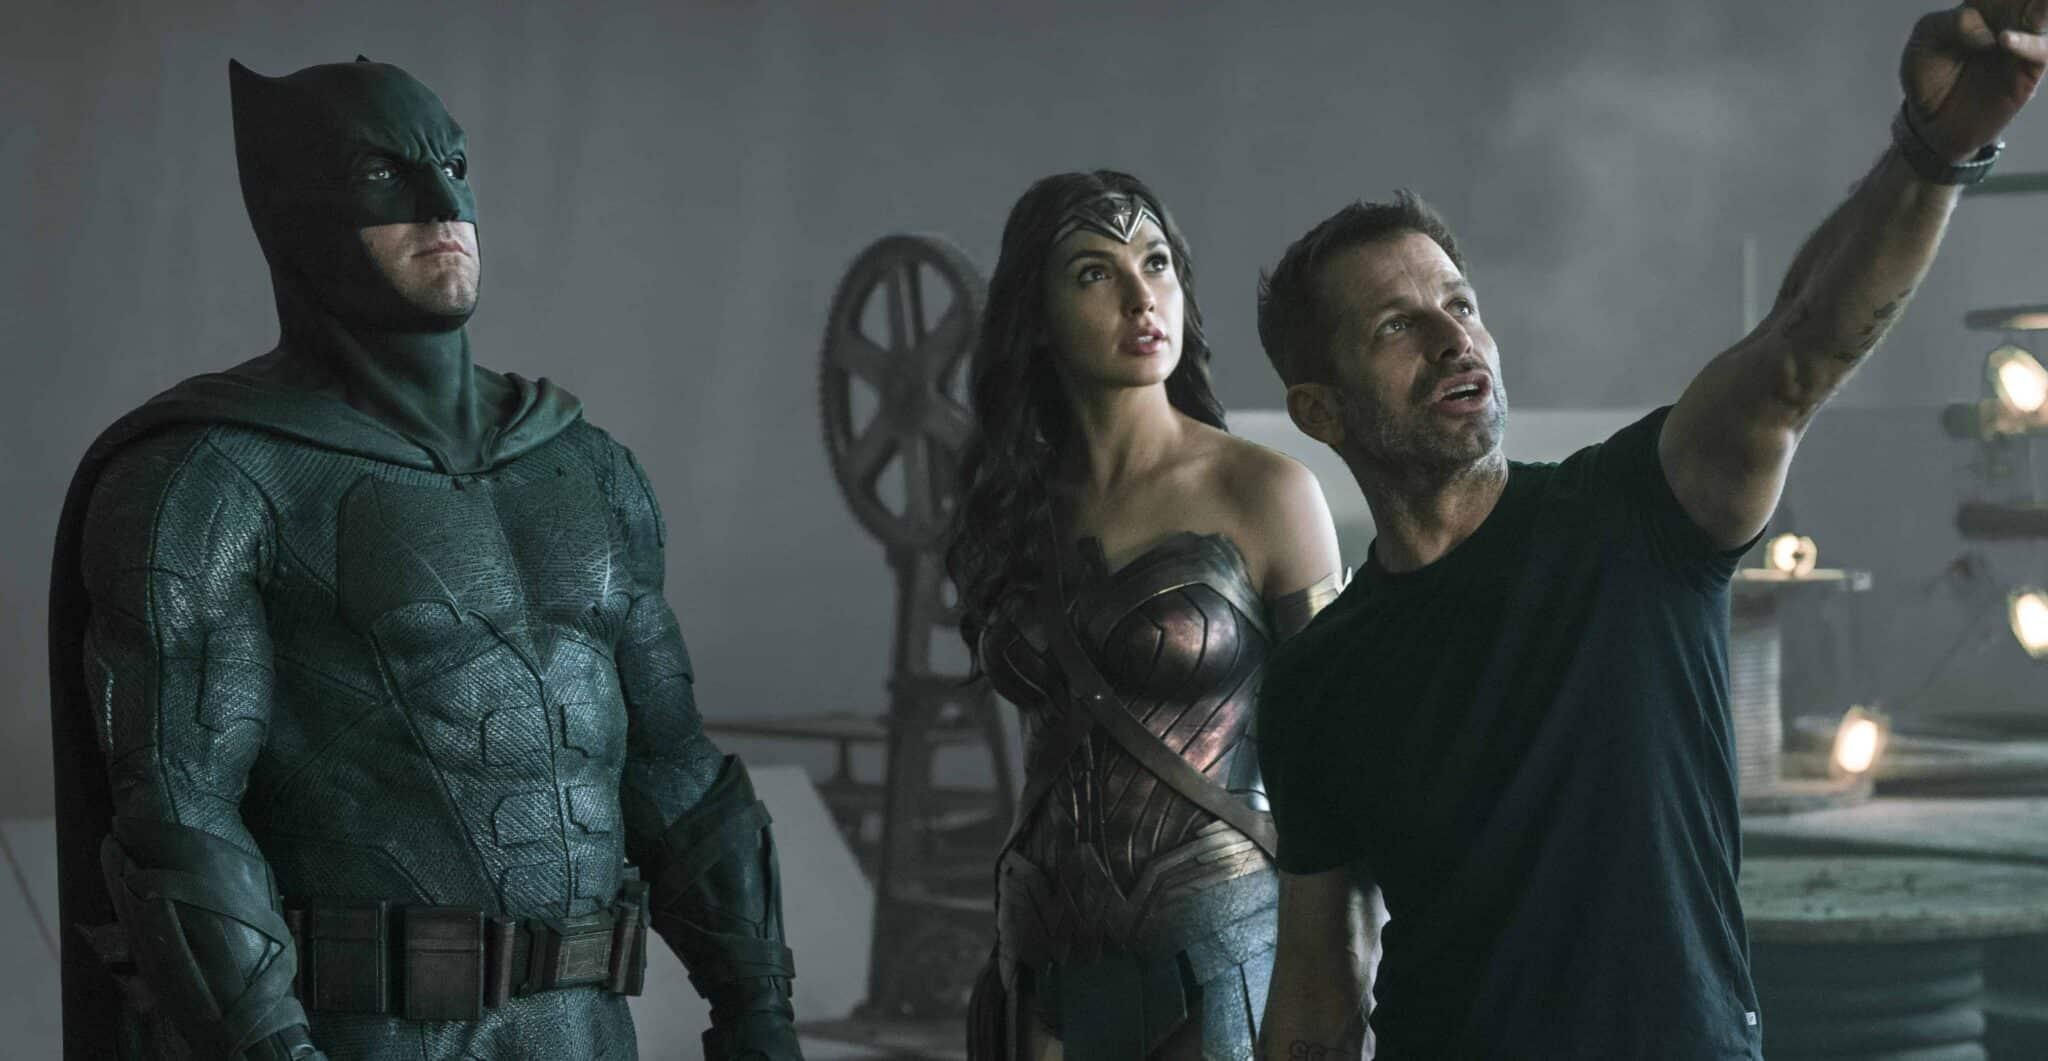 ReleaseTheSynderCut Zack Snyder's Justice League